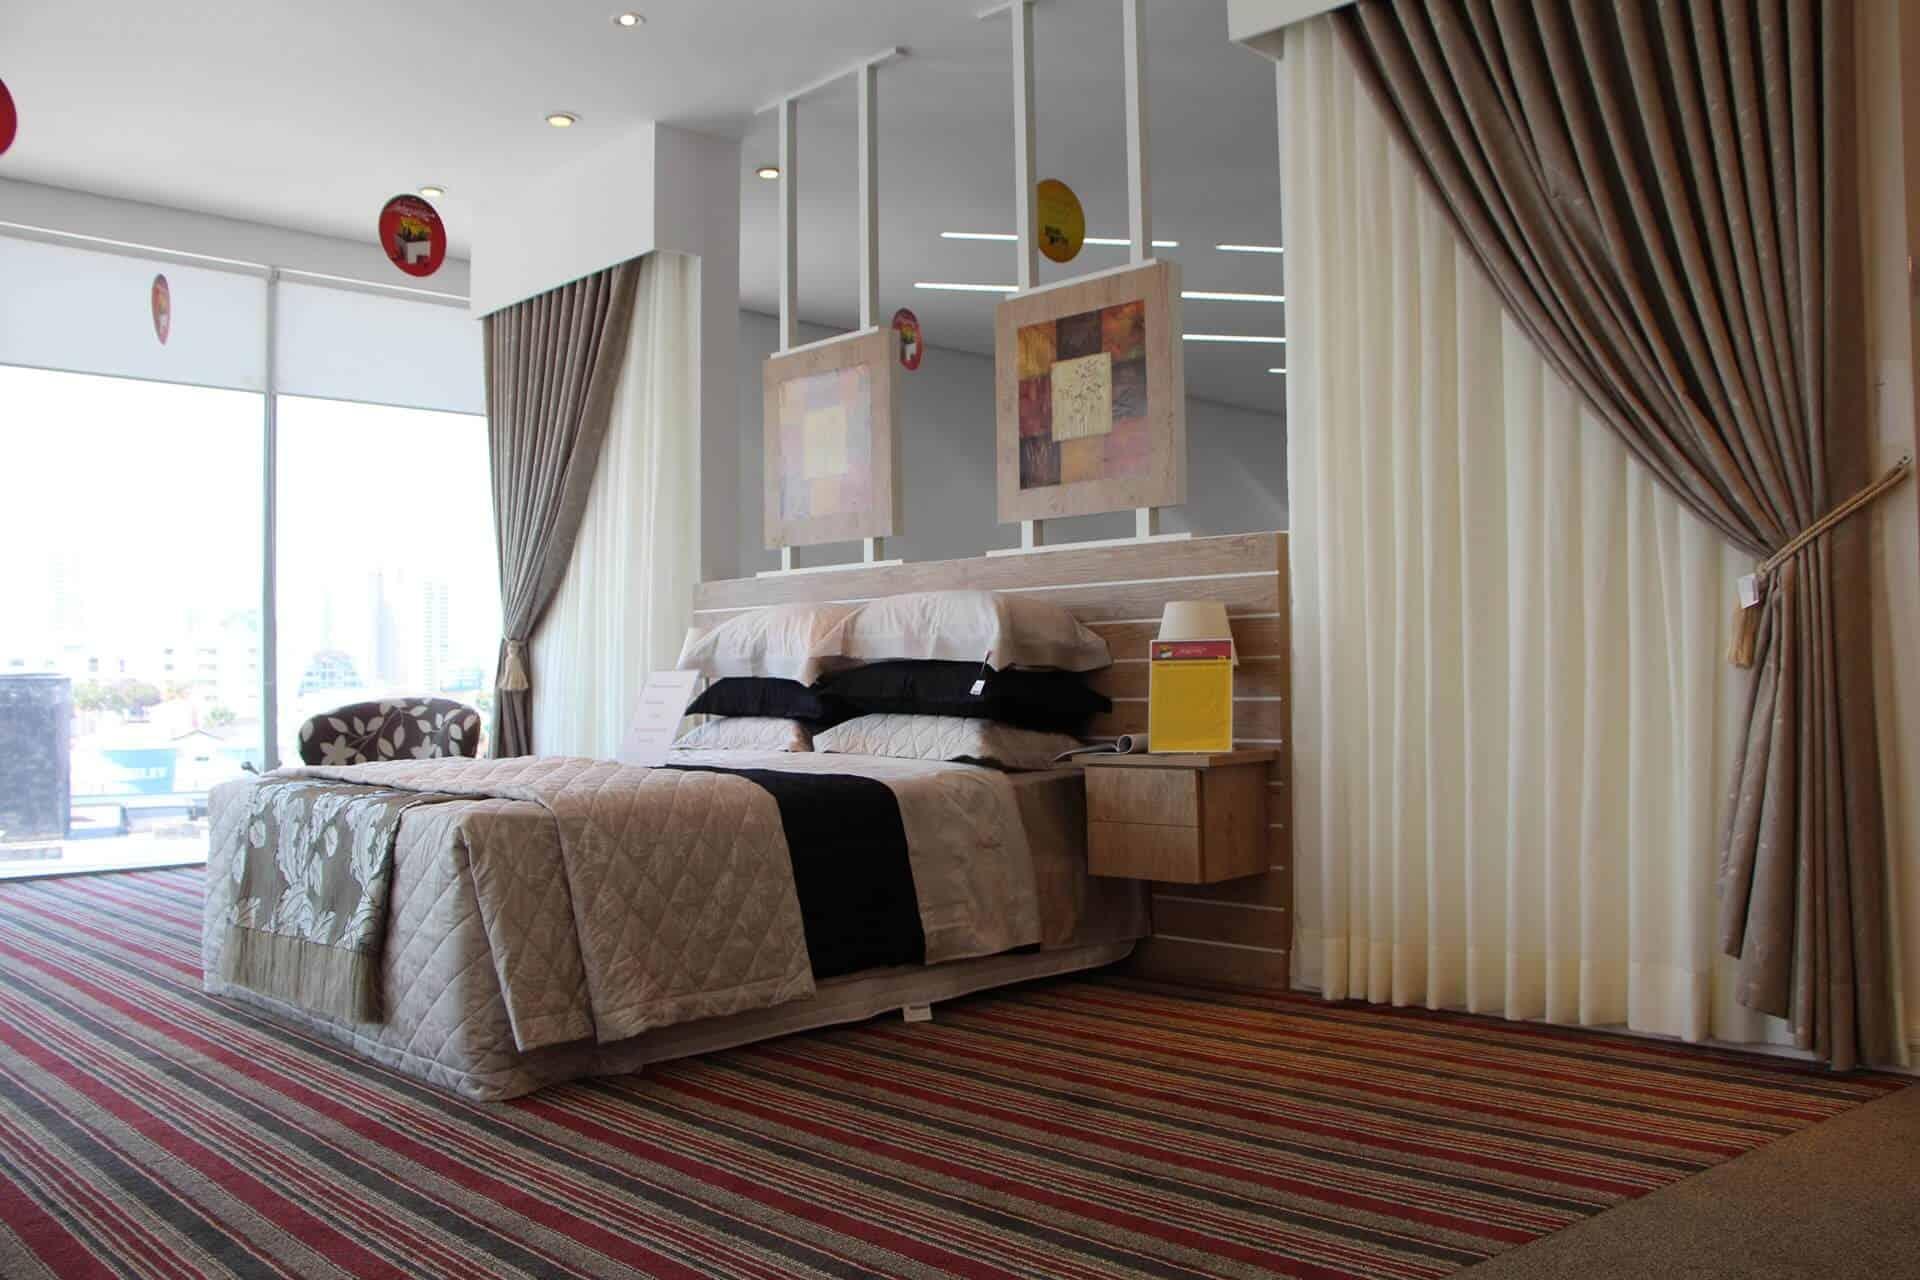 dormitorio-planejado_moveis-sob-medida-galeria-23